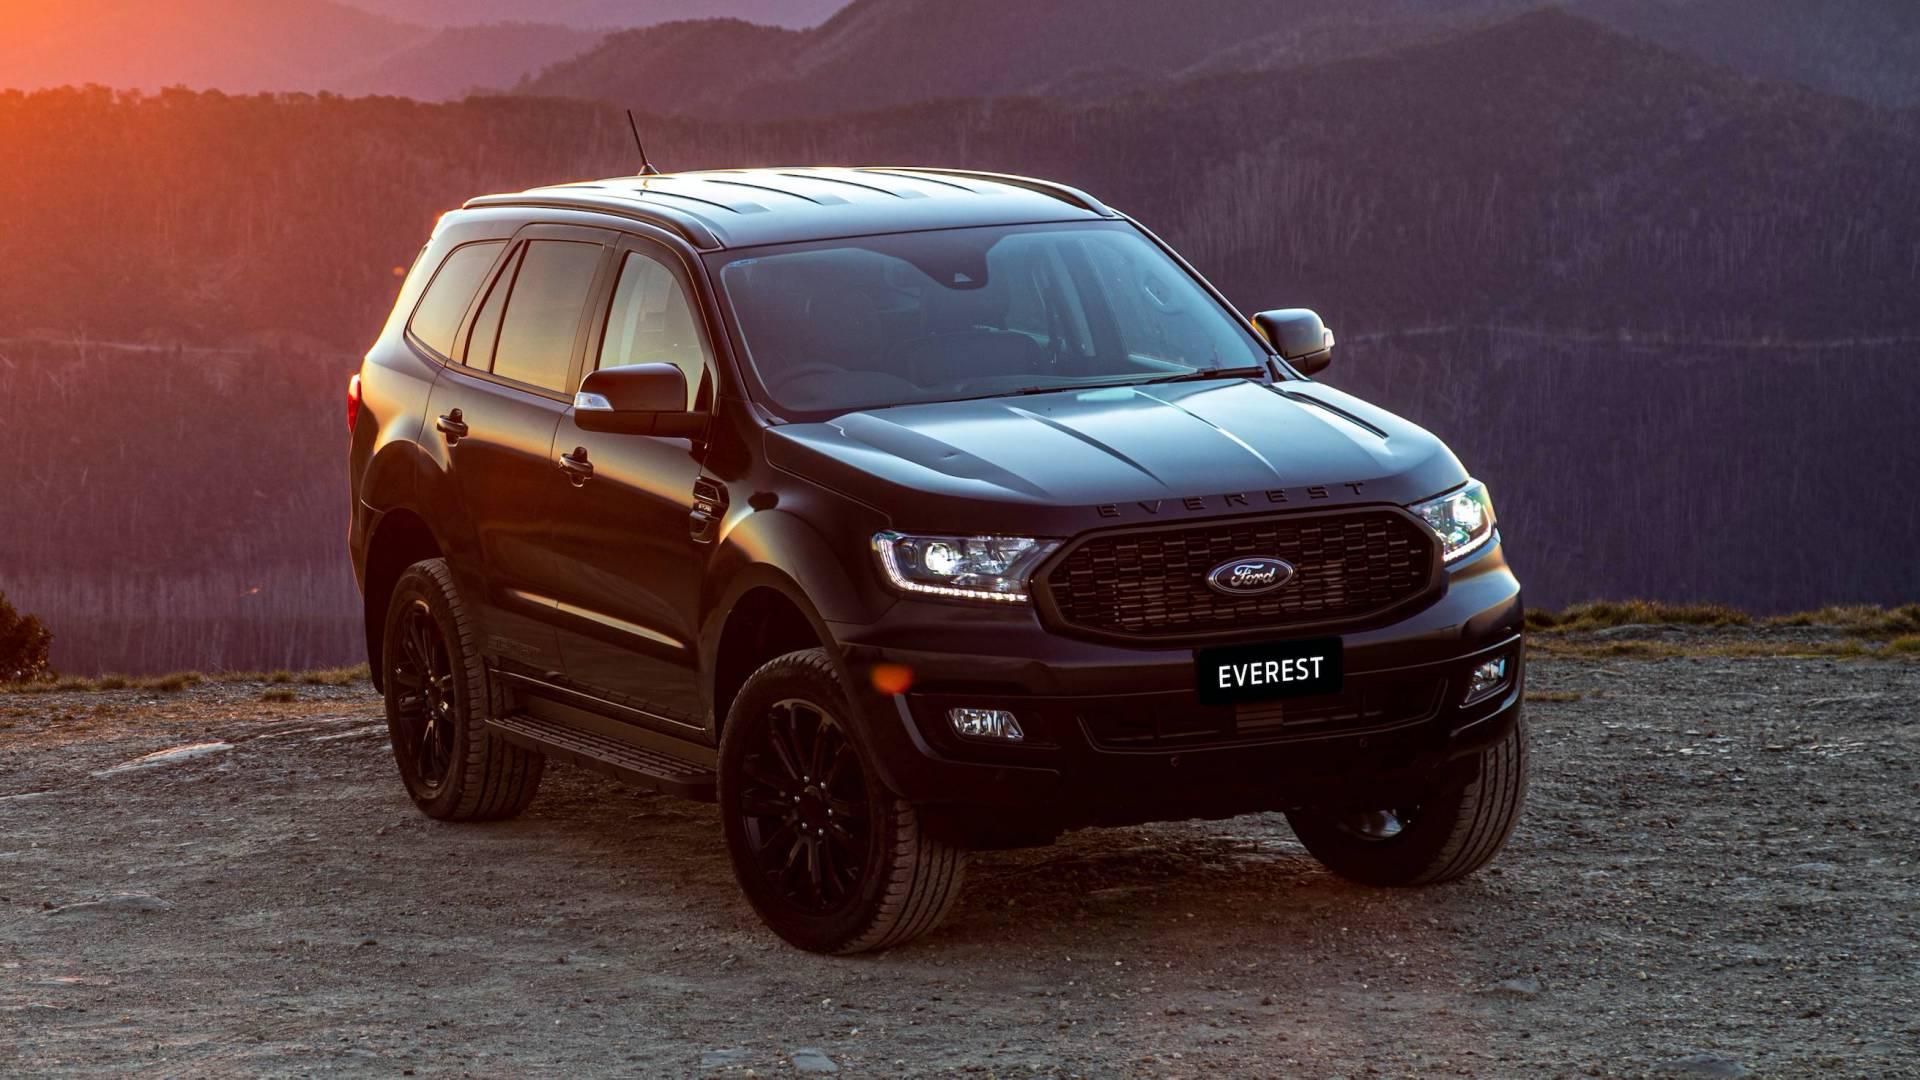 2021 ford everest sport australia spec 7 - Chi tiết Ford Everest Sport 2021 – Phiên bản thể thao cho phái mạnh